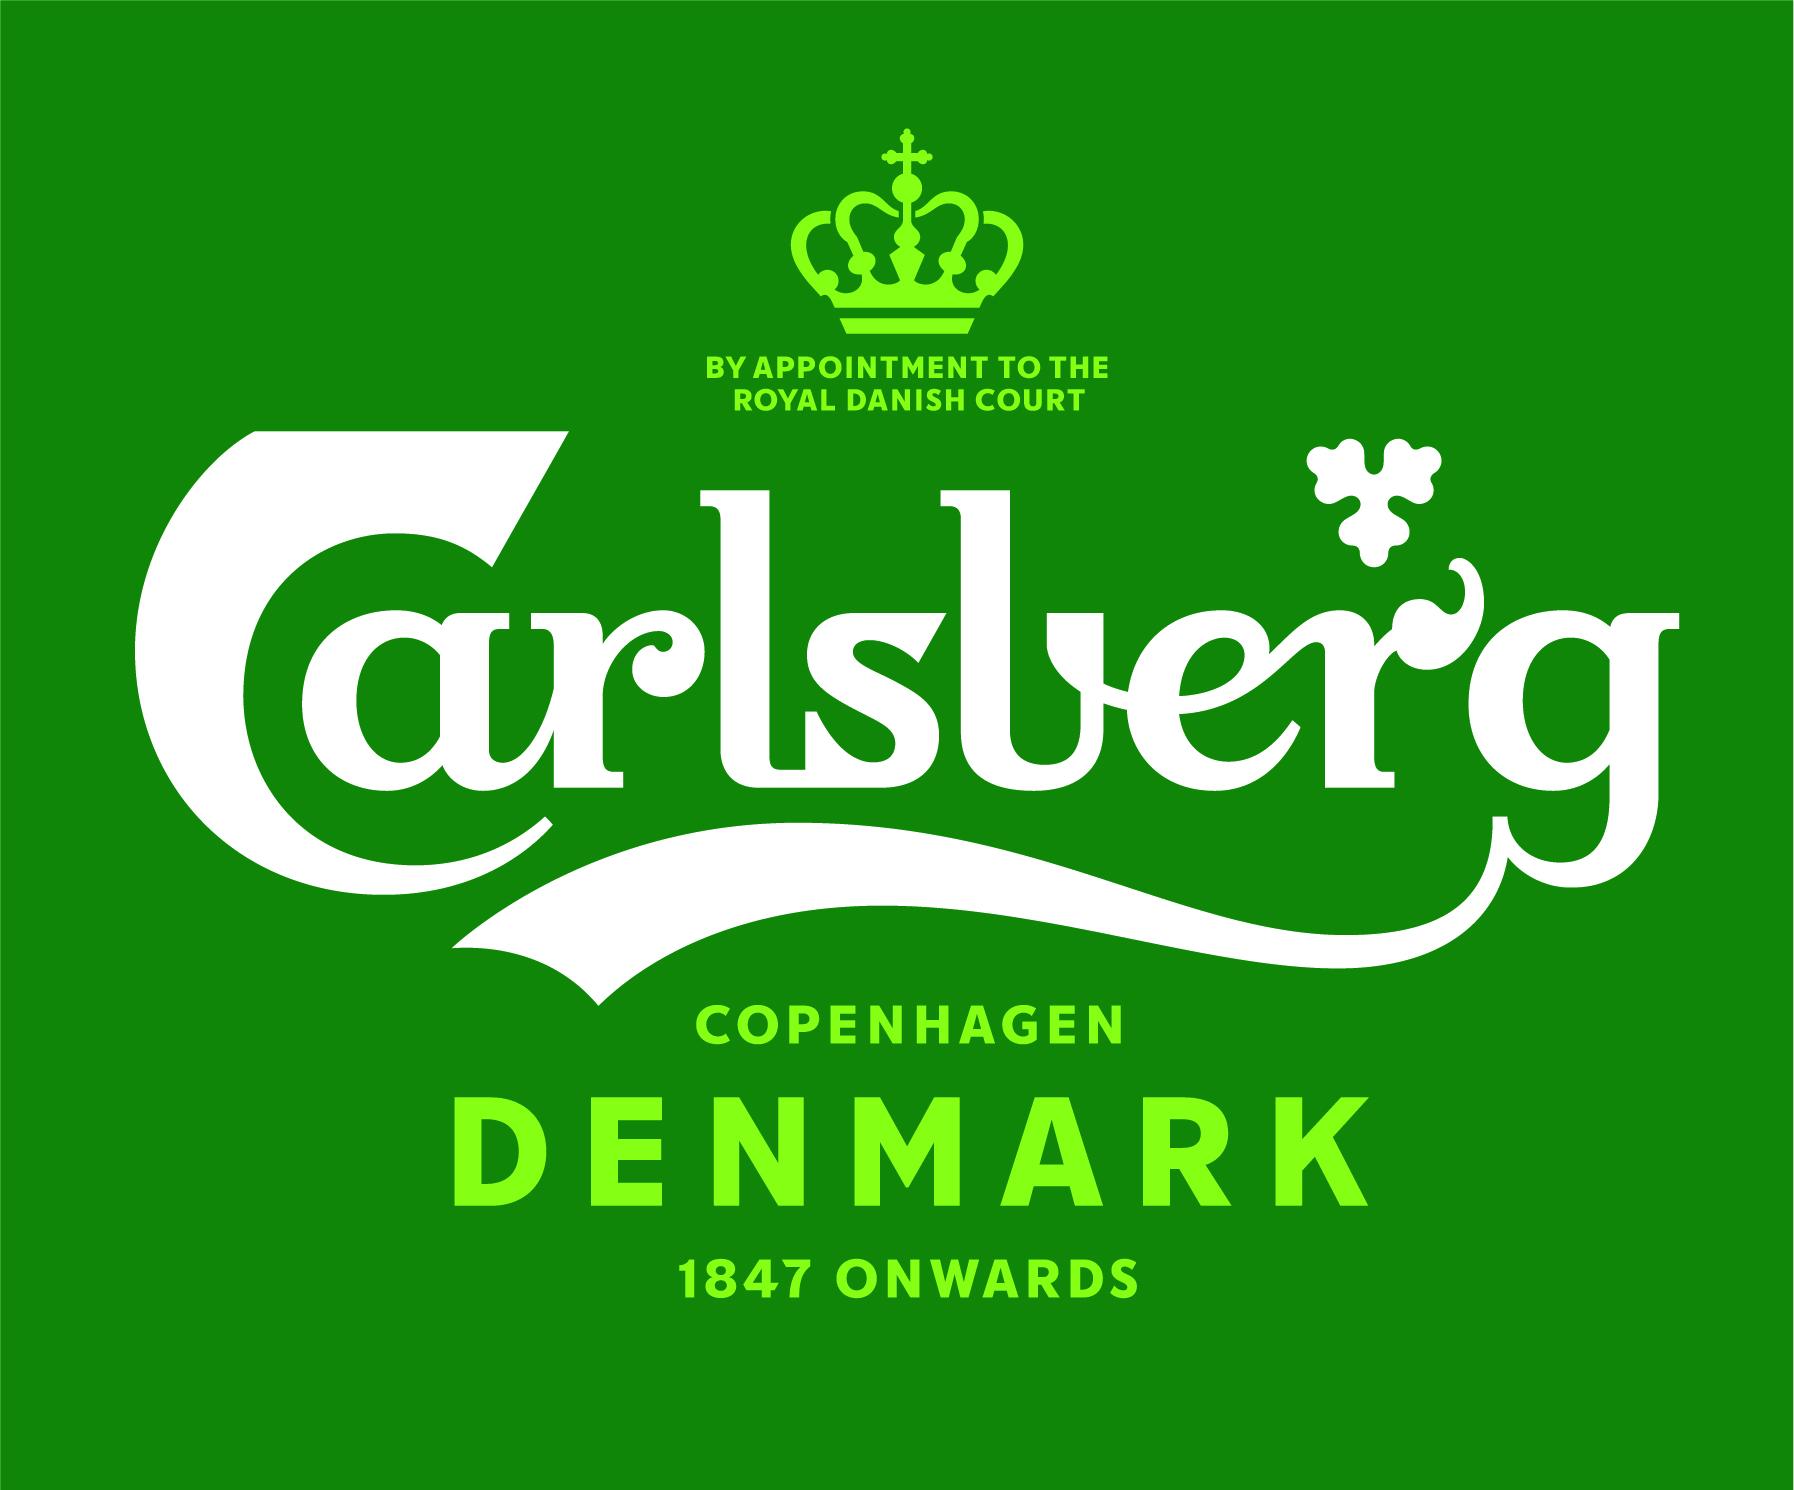 CarlsbergUKLtd